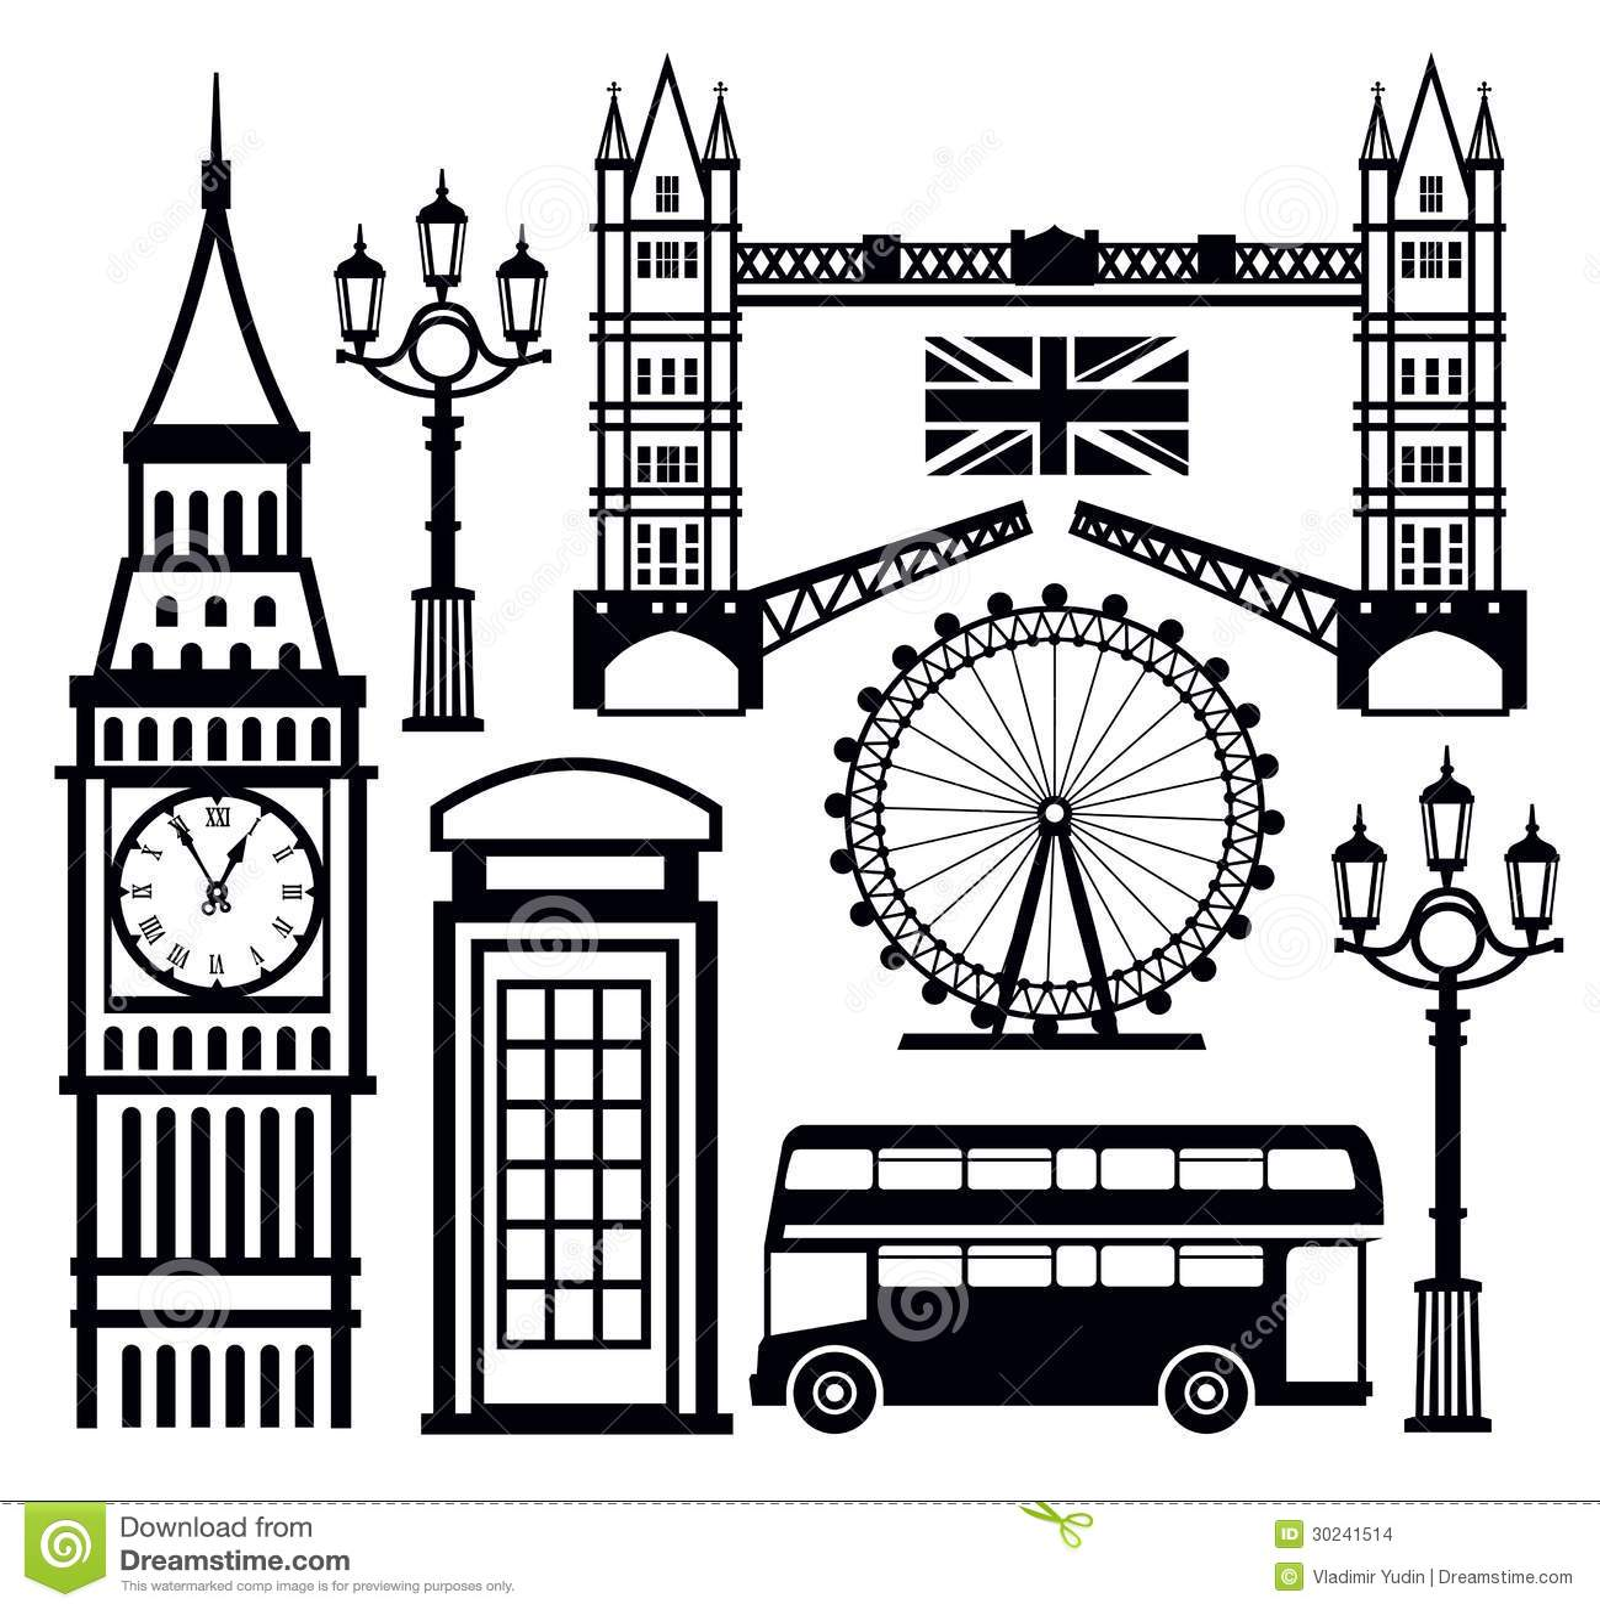 London Icon Stock Images - Image: 30241514